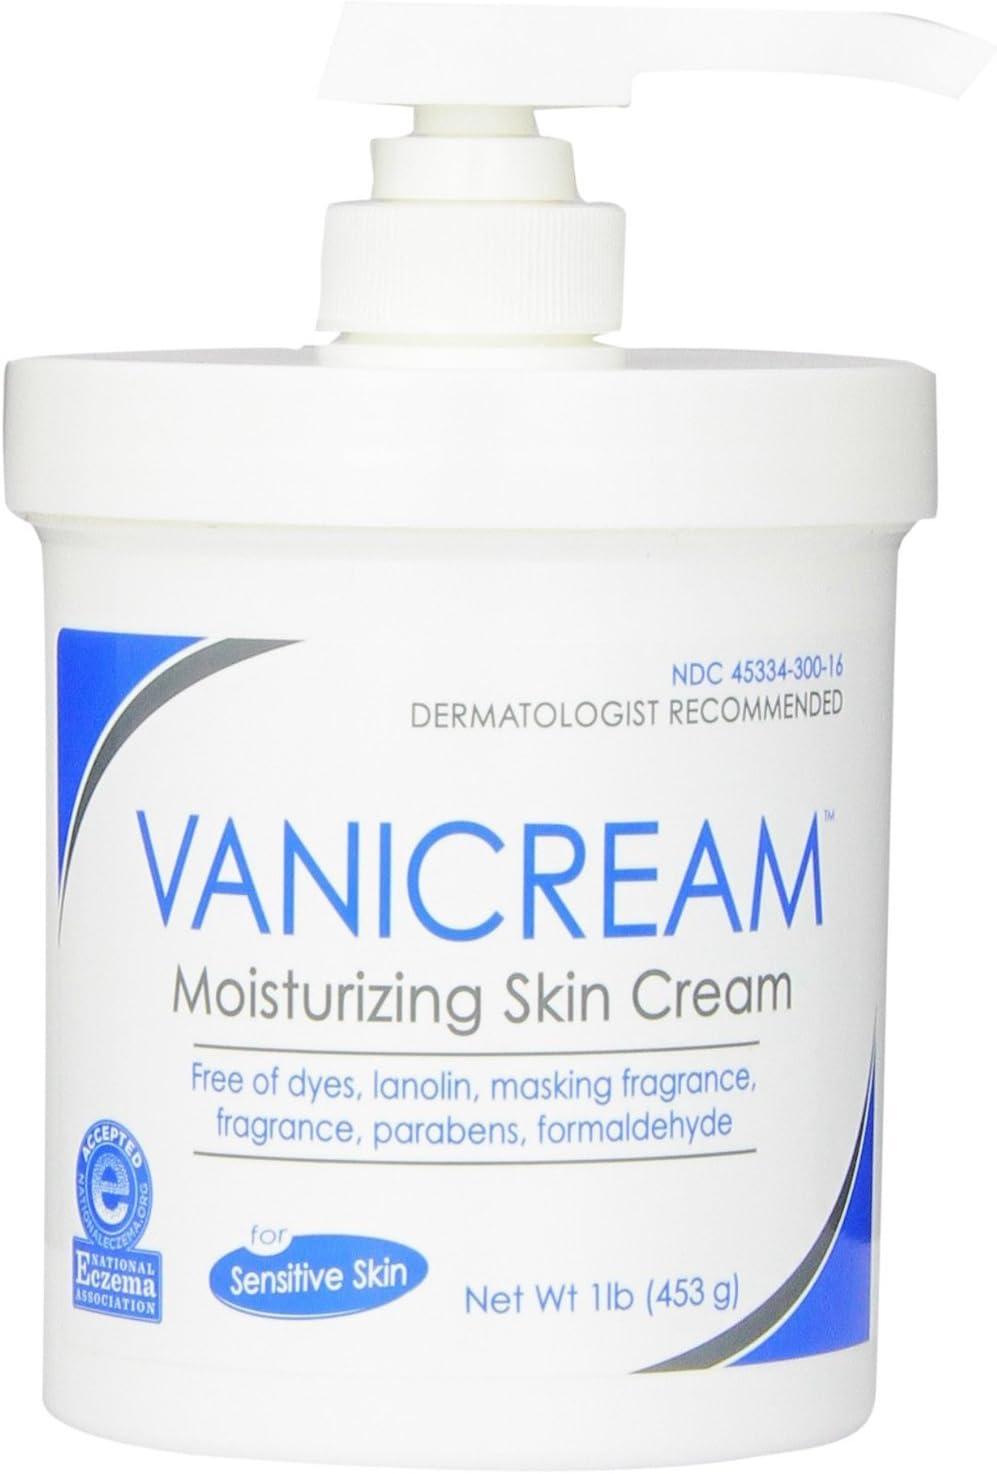 Vanicream Moisturizing Skin Cream with Pump Dispenser, 4 Pound Pack